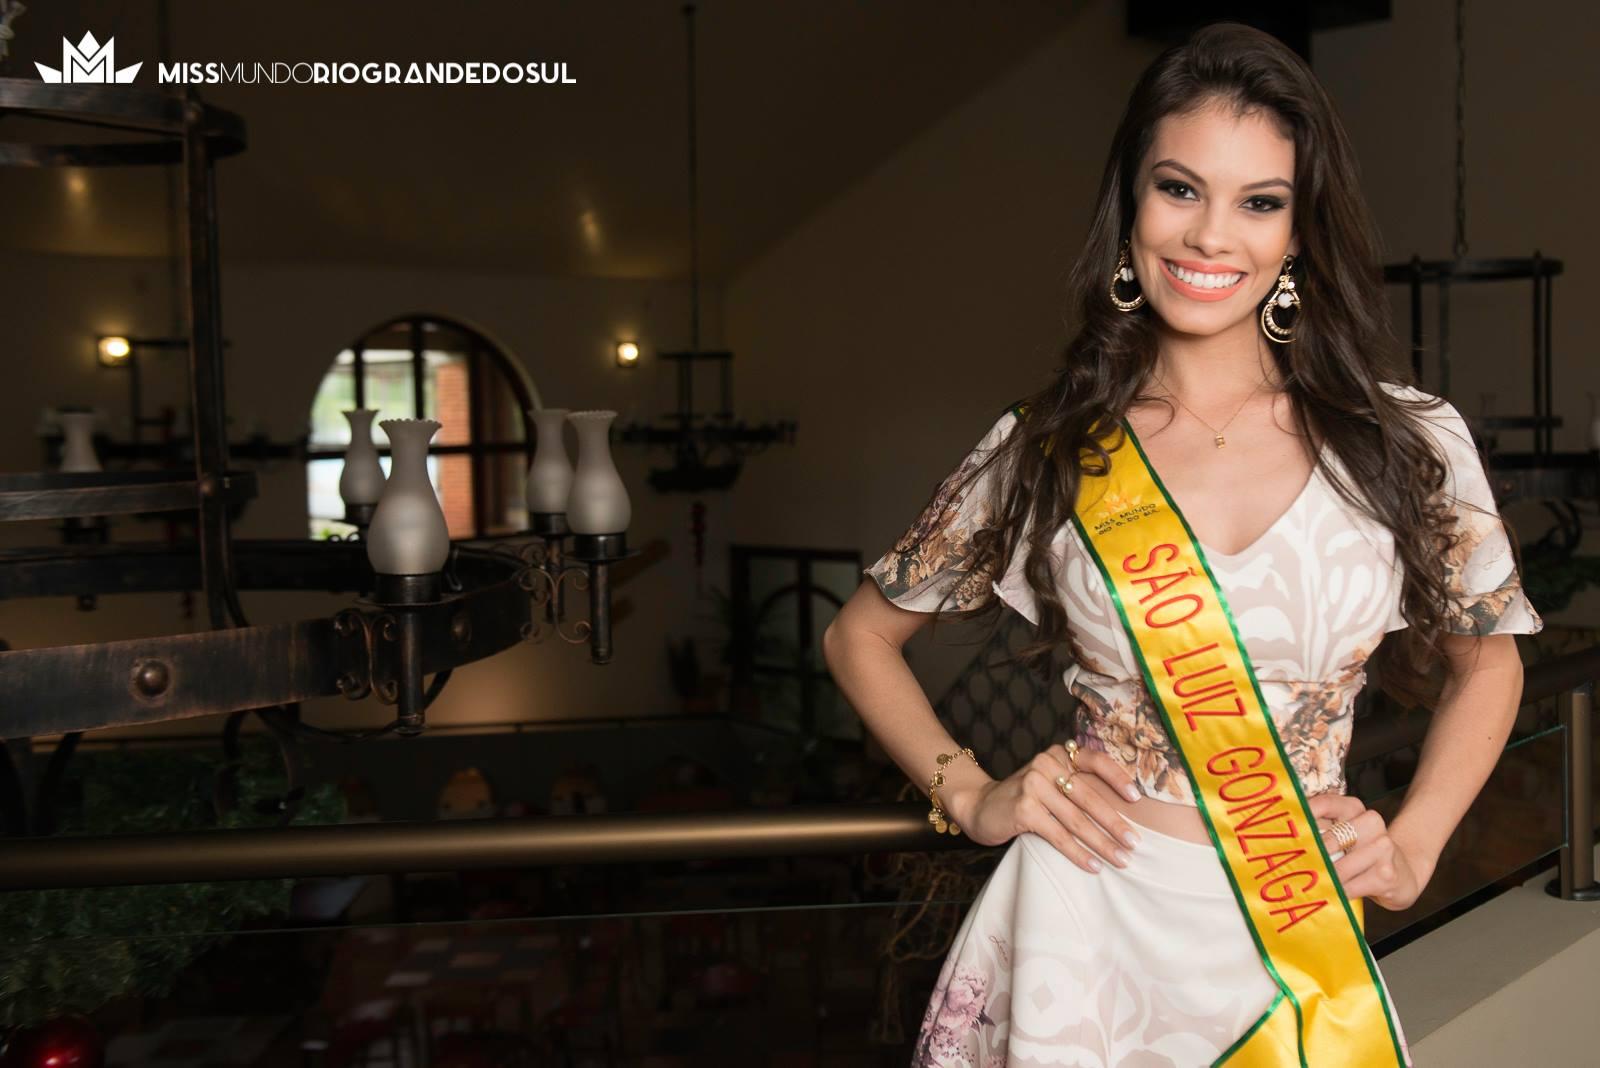 muriel prestes, top 16 de miss brasil mundo 2016. - Página 2 Tyaloujq